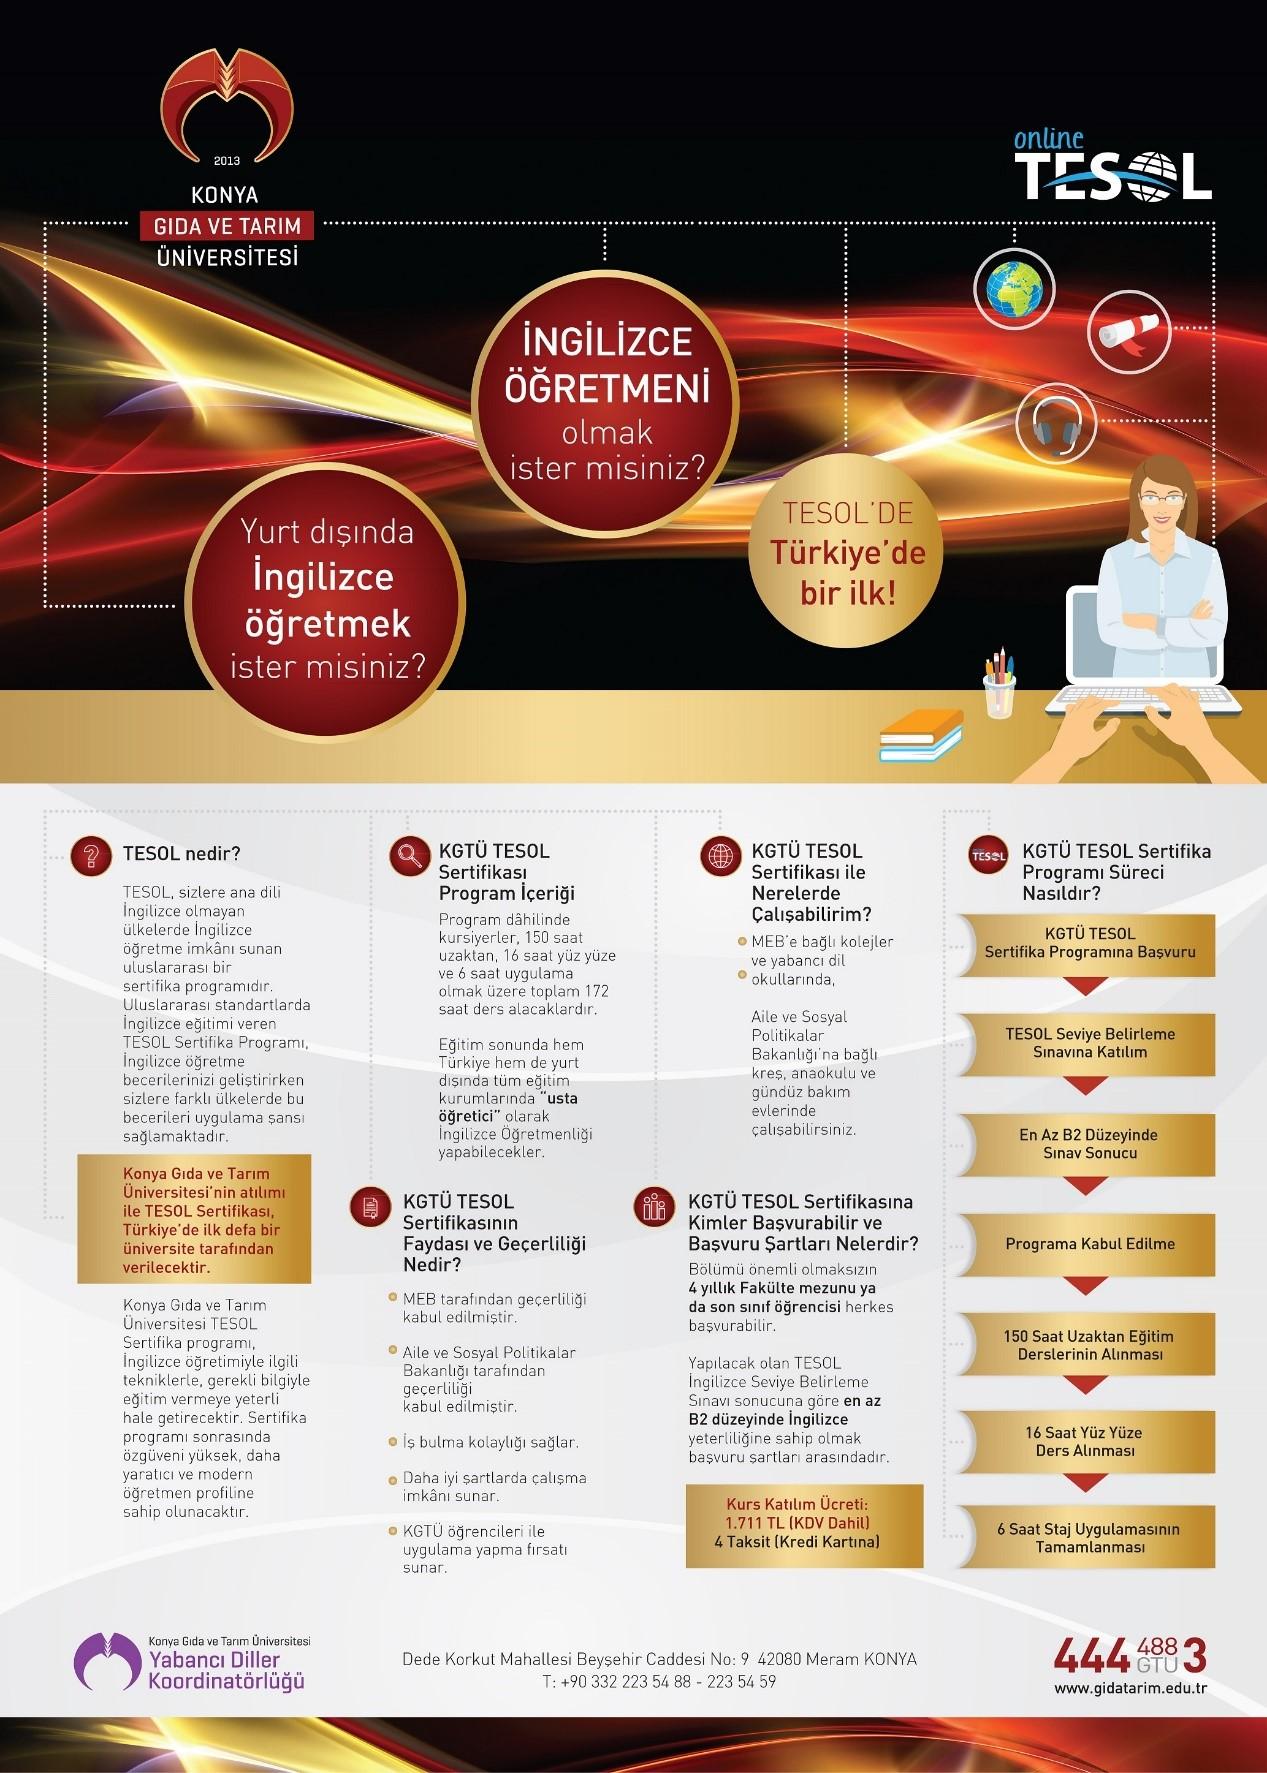 Registrations For Konya Food And Agriculture University Online Tesol